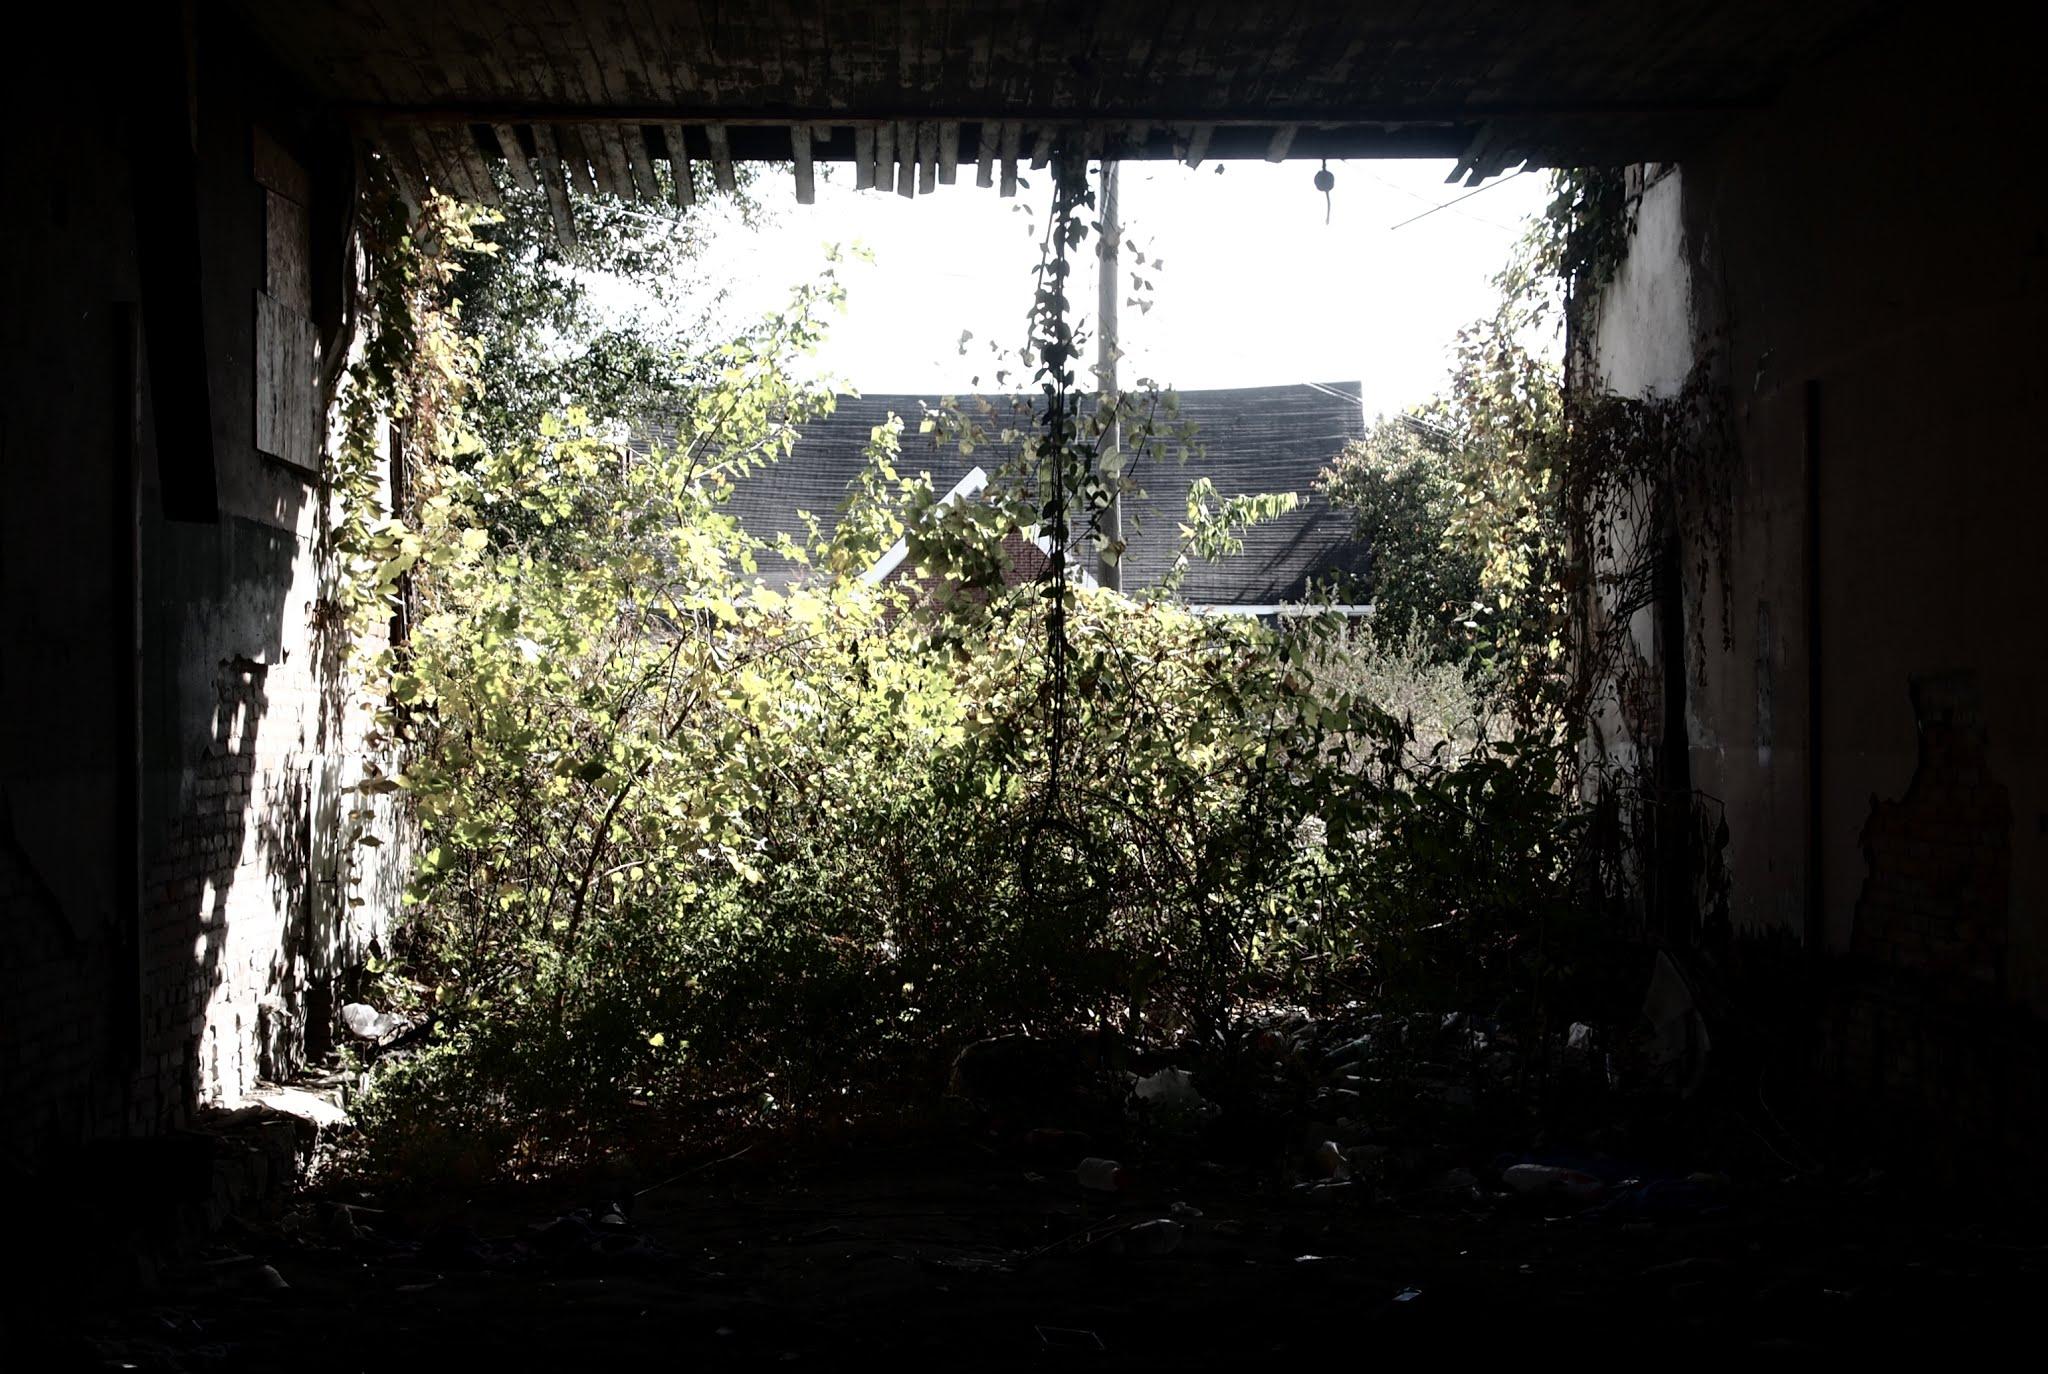 Desolate Building